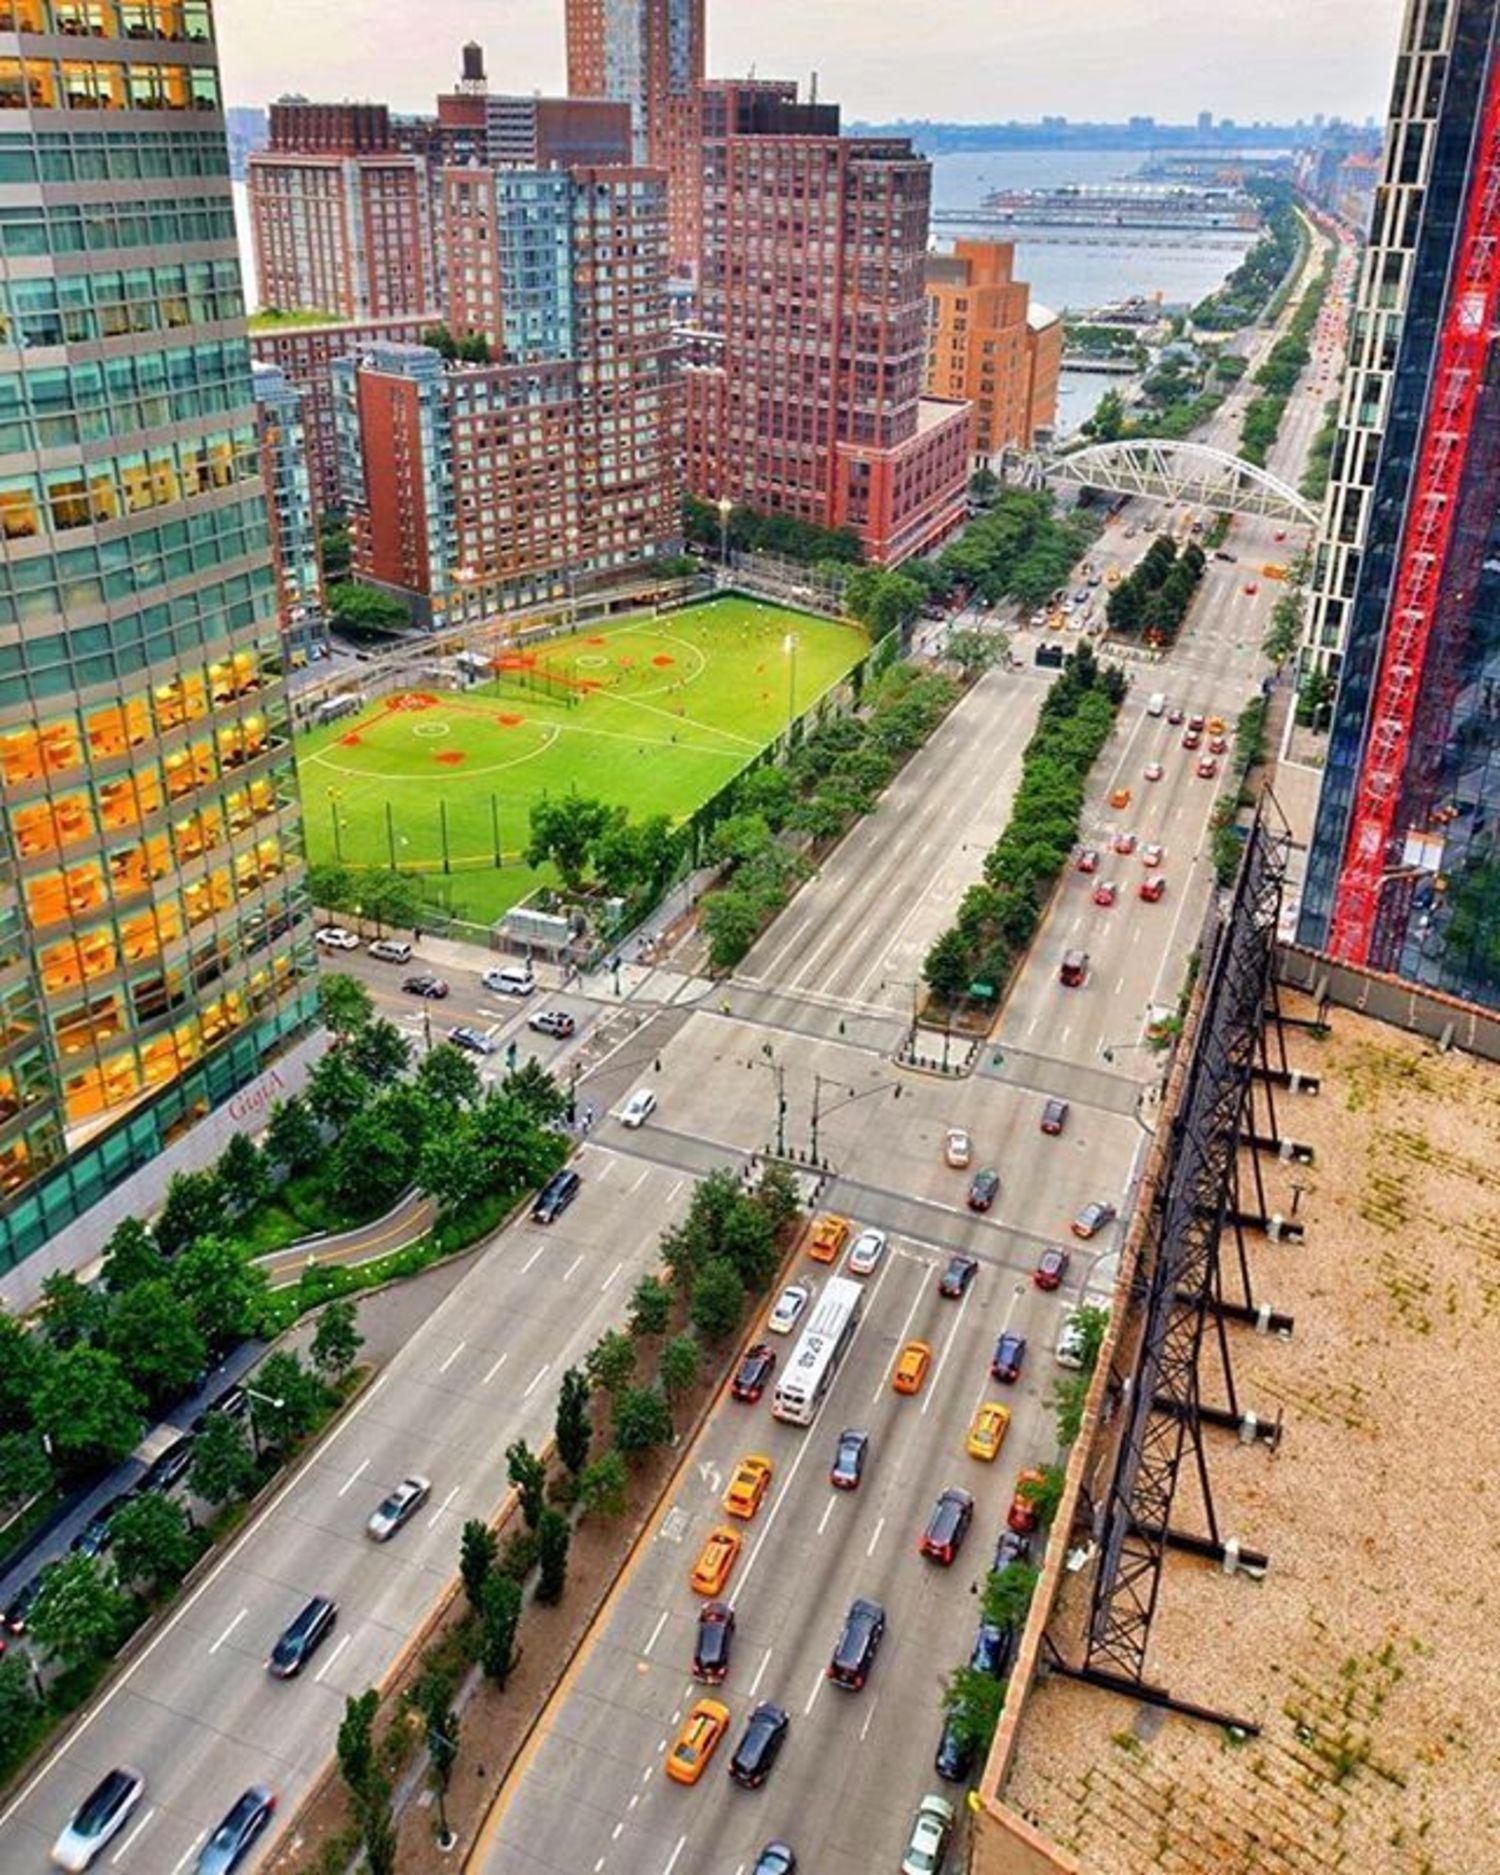 West Side Highway, New York, New York. Photo via @gigi.nyc #viewingnyc #newyorkcity #newyork